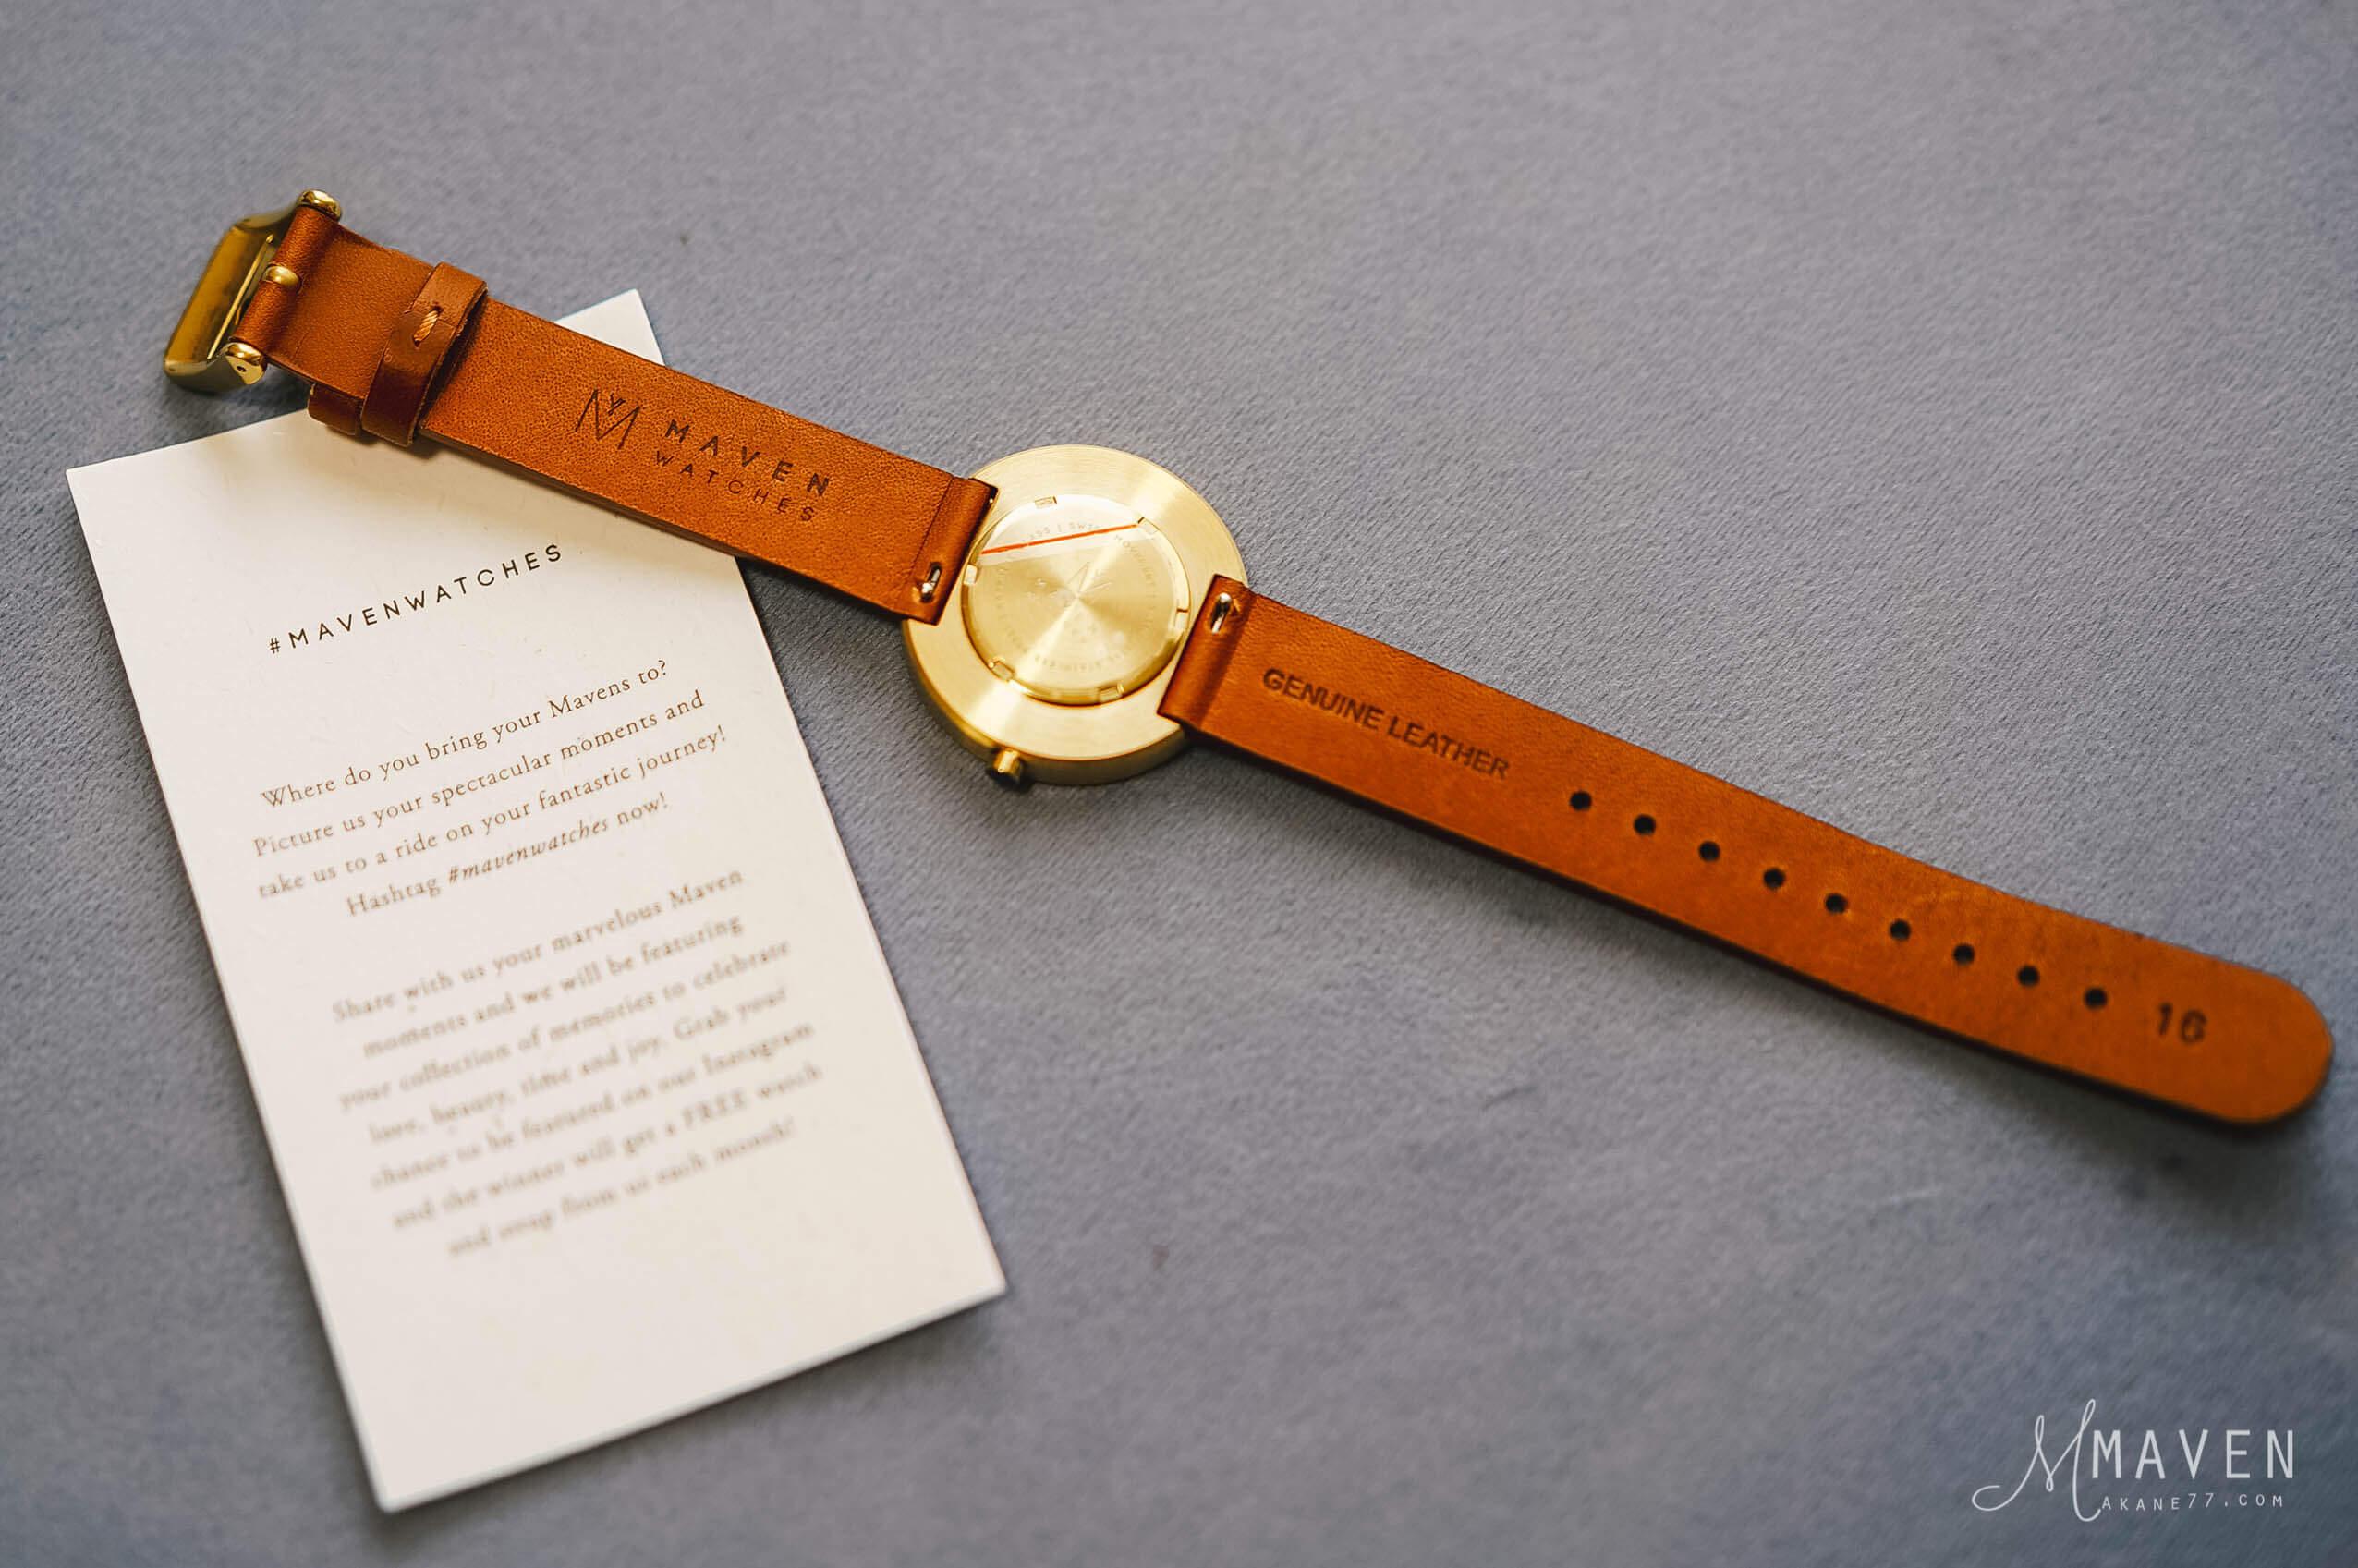 DSC01477-1MAVEN WATCHES 錶帶背面